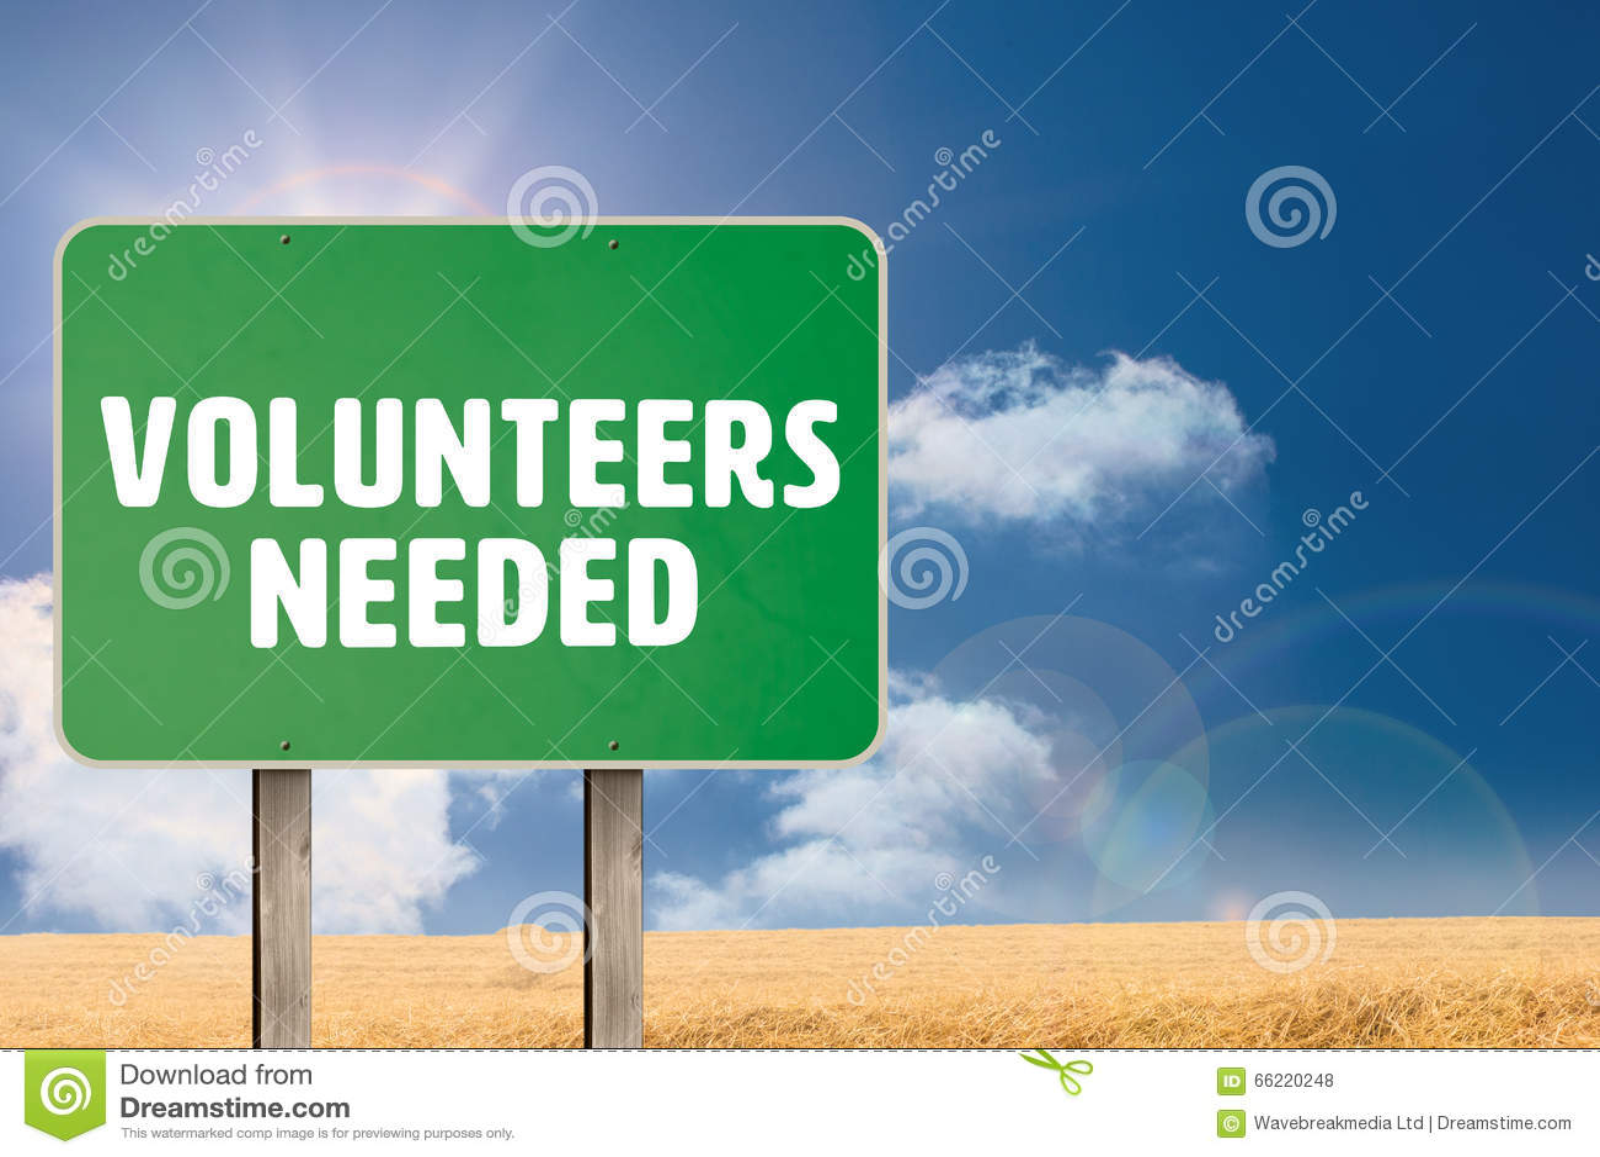 Immagine composita dei volontari stati necessari